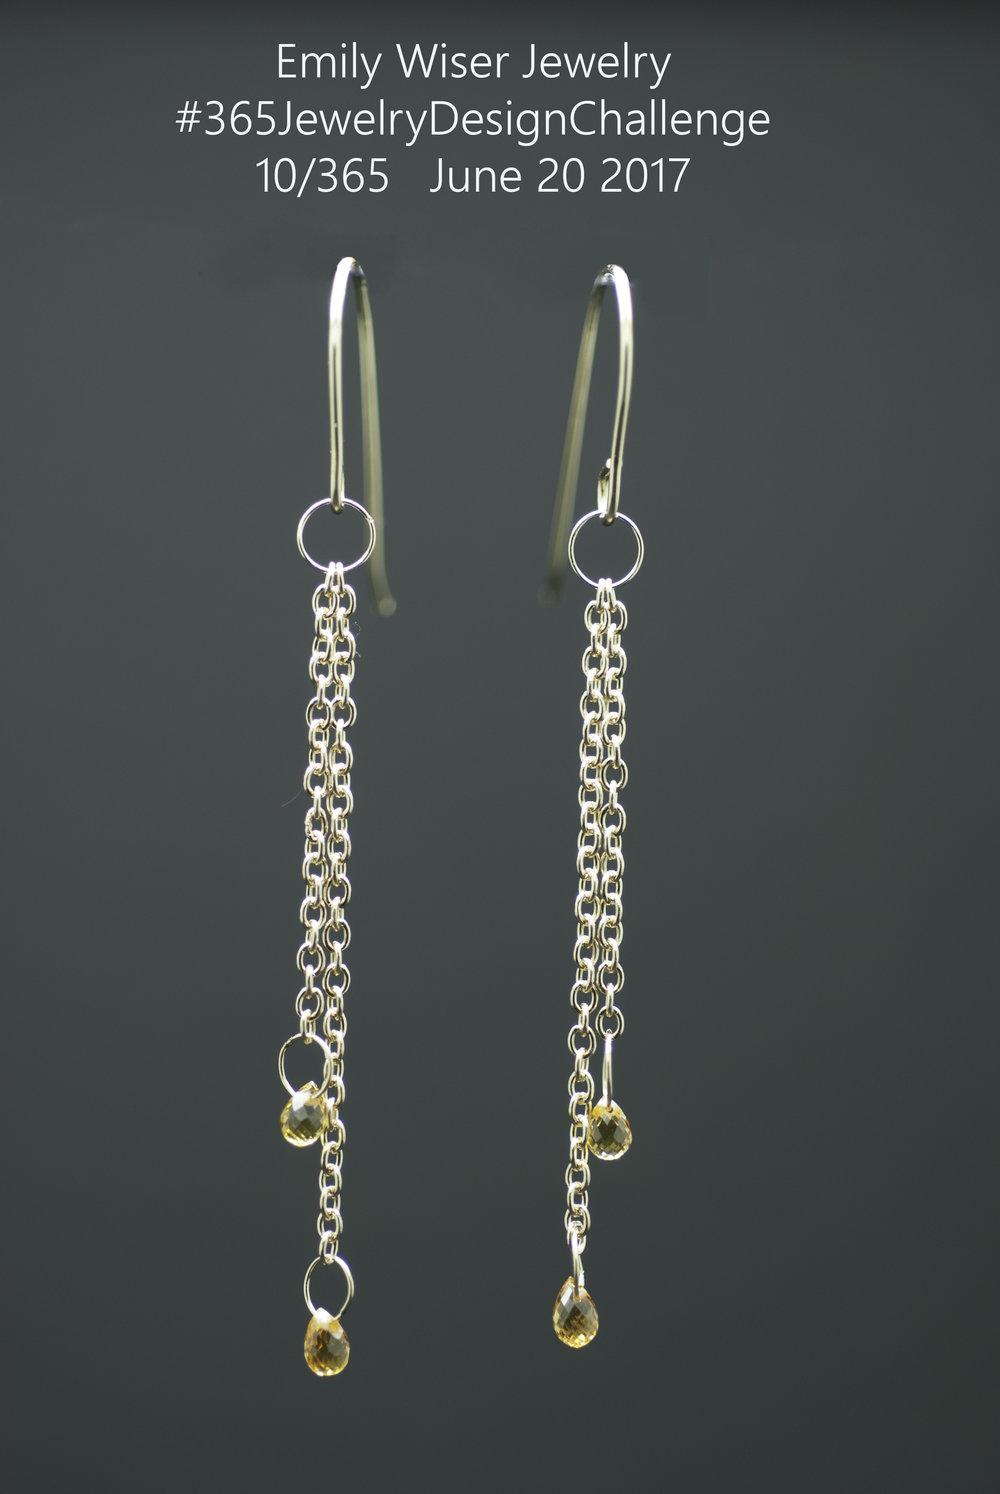 14k Gold, Yellow Sapphire Chain Earrings